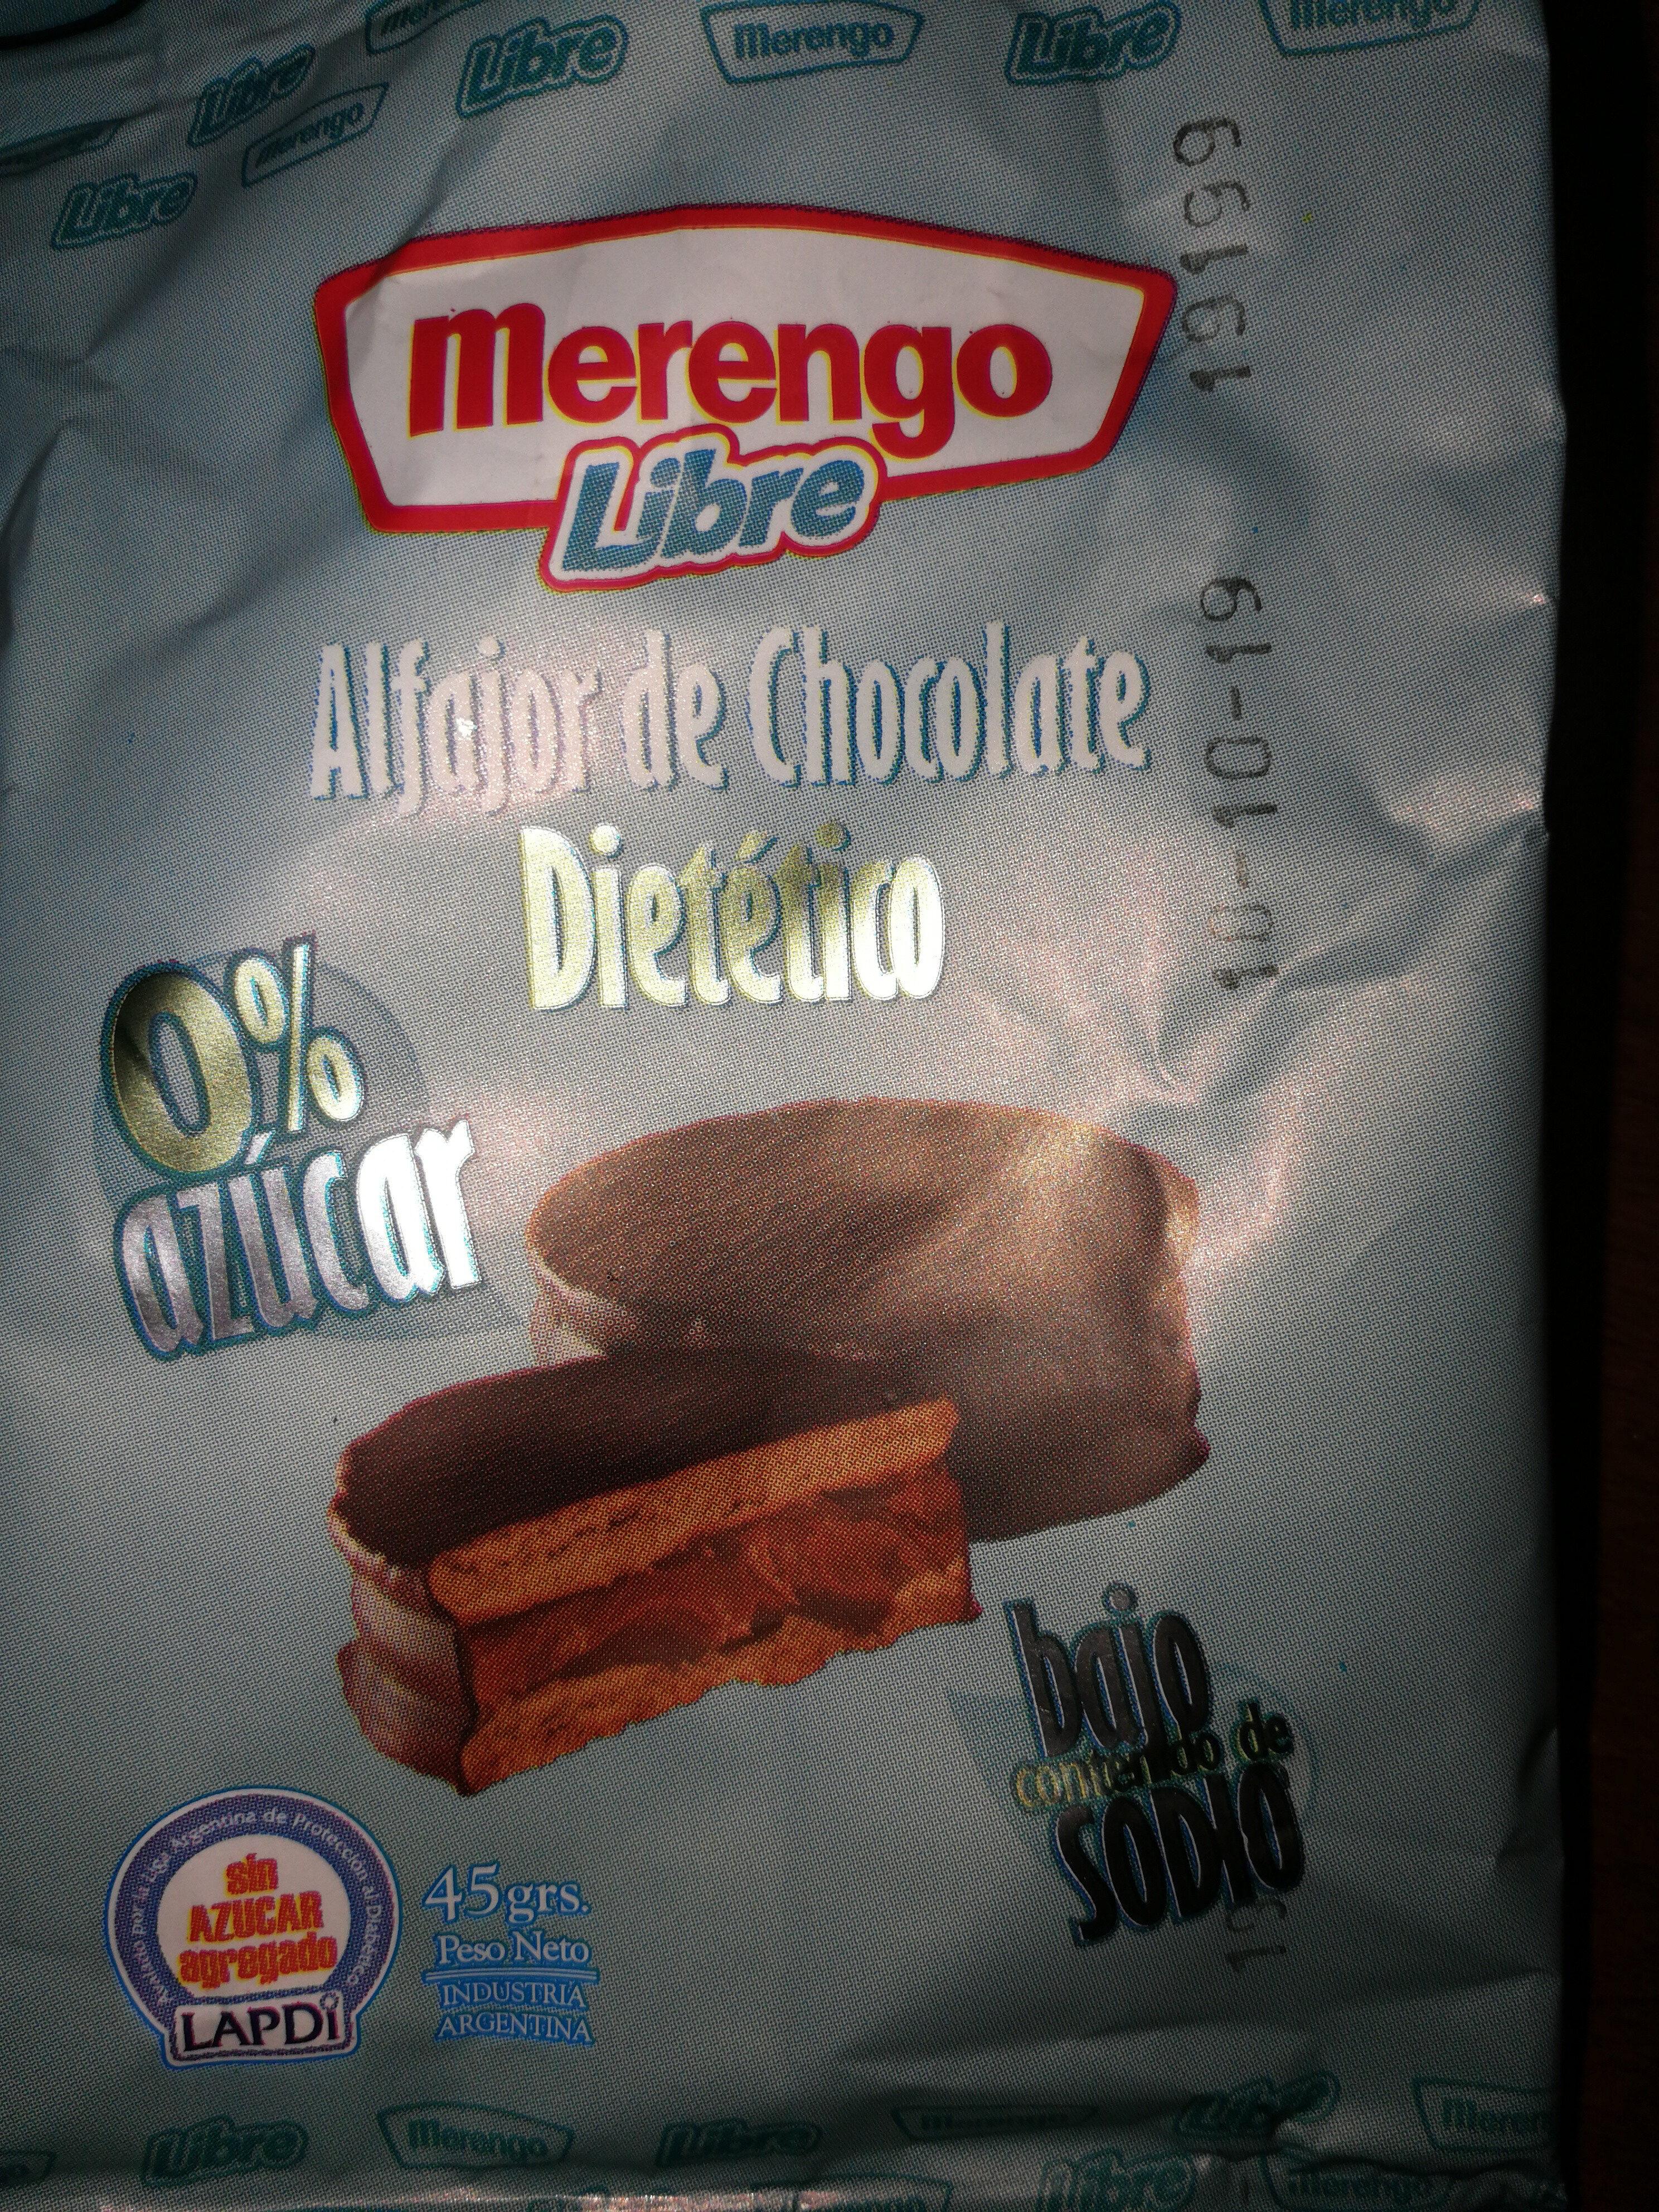 Merengo Libre - Alfajor de Chocolate Dietetico - Product - es